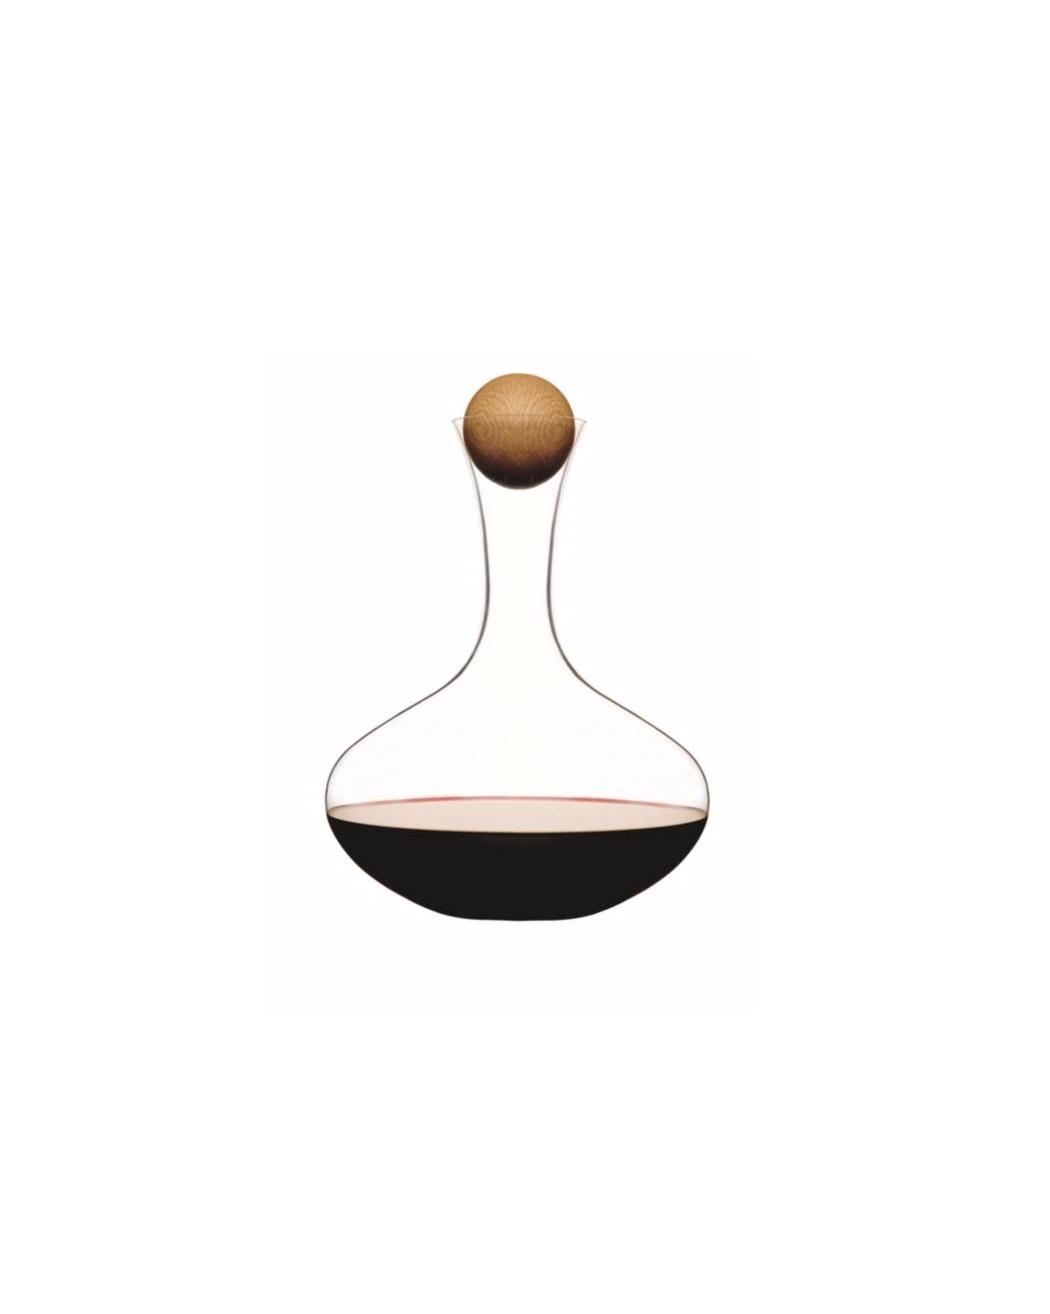 hollowware anniversary gifts wine carage sagaform